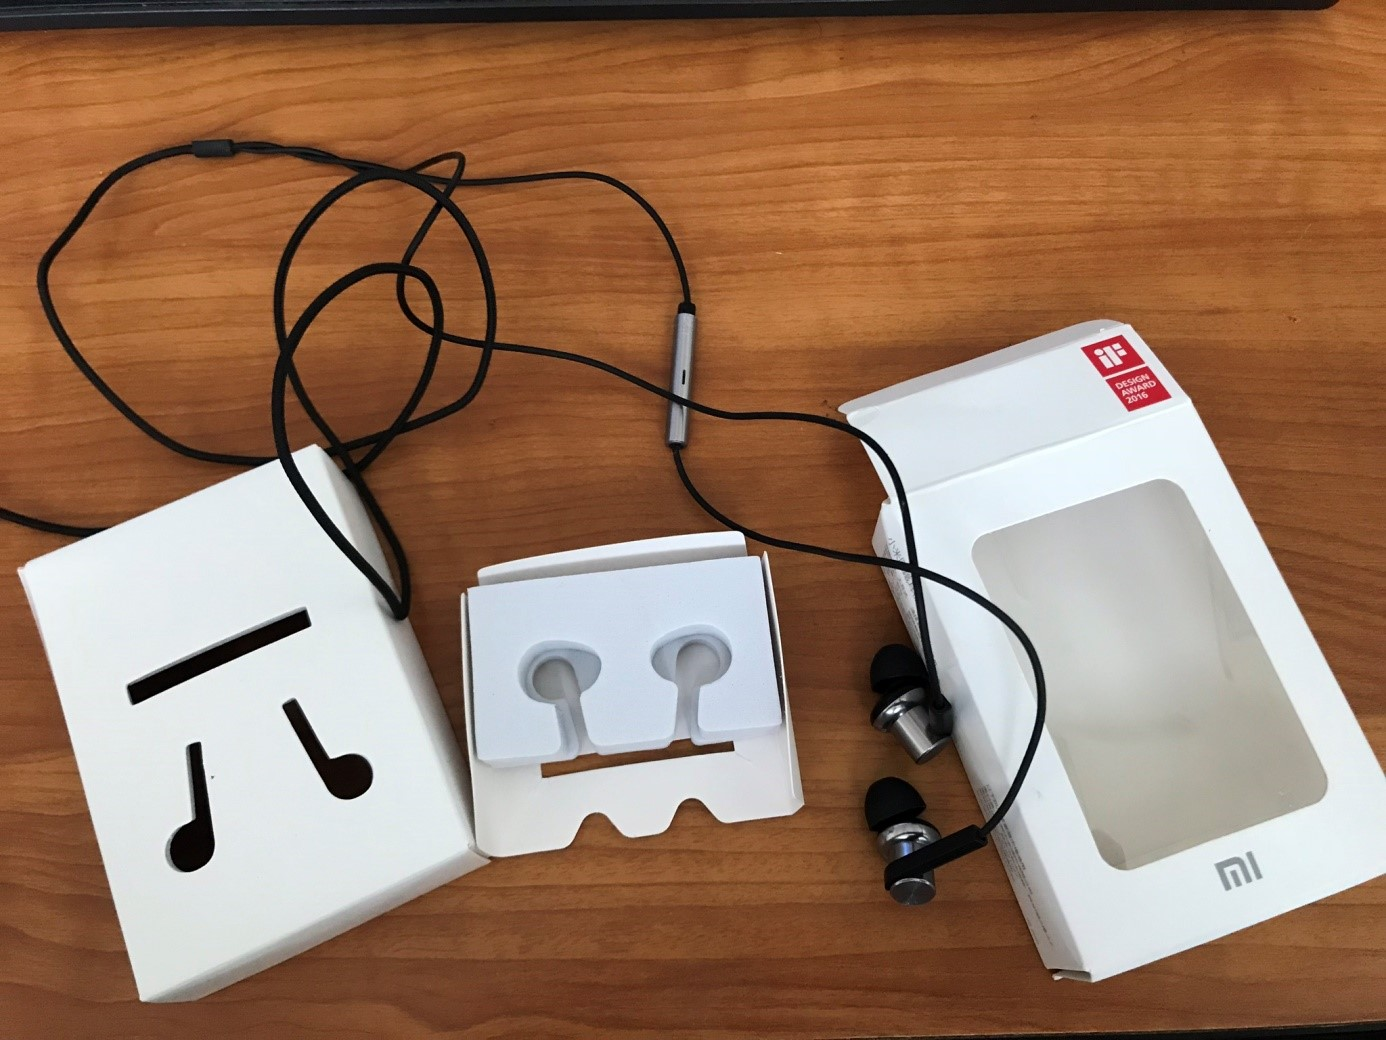 xiaomi-mi-iv-hybrid-dual-drivers-fulhallgato-teszt-earphones-02.jpg